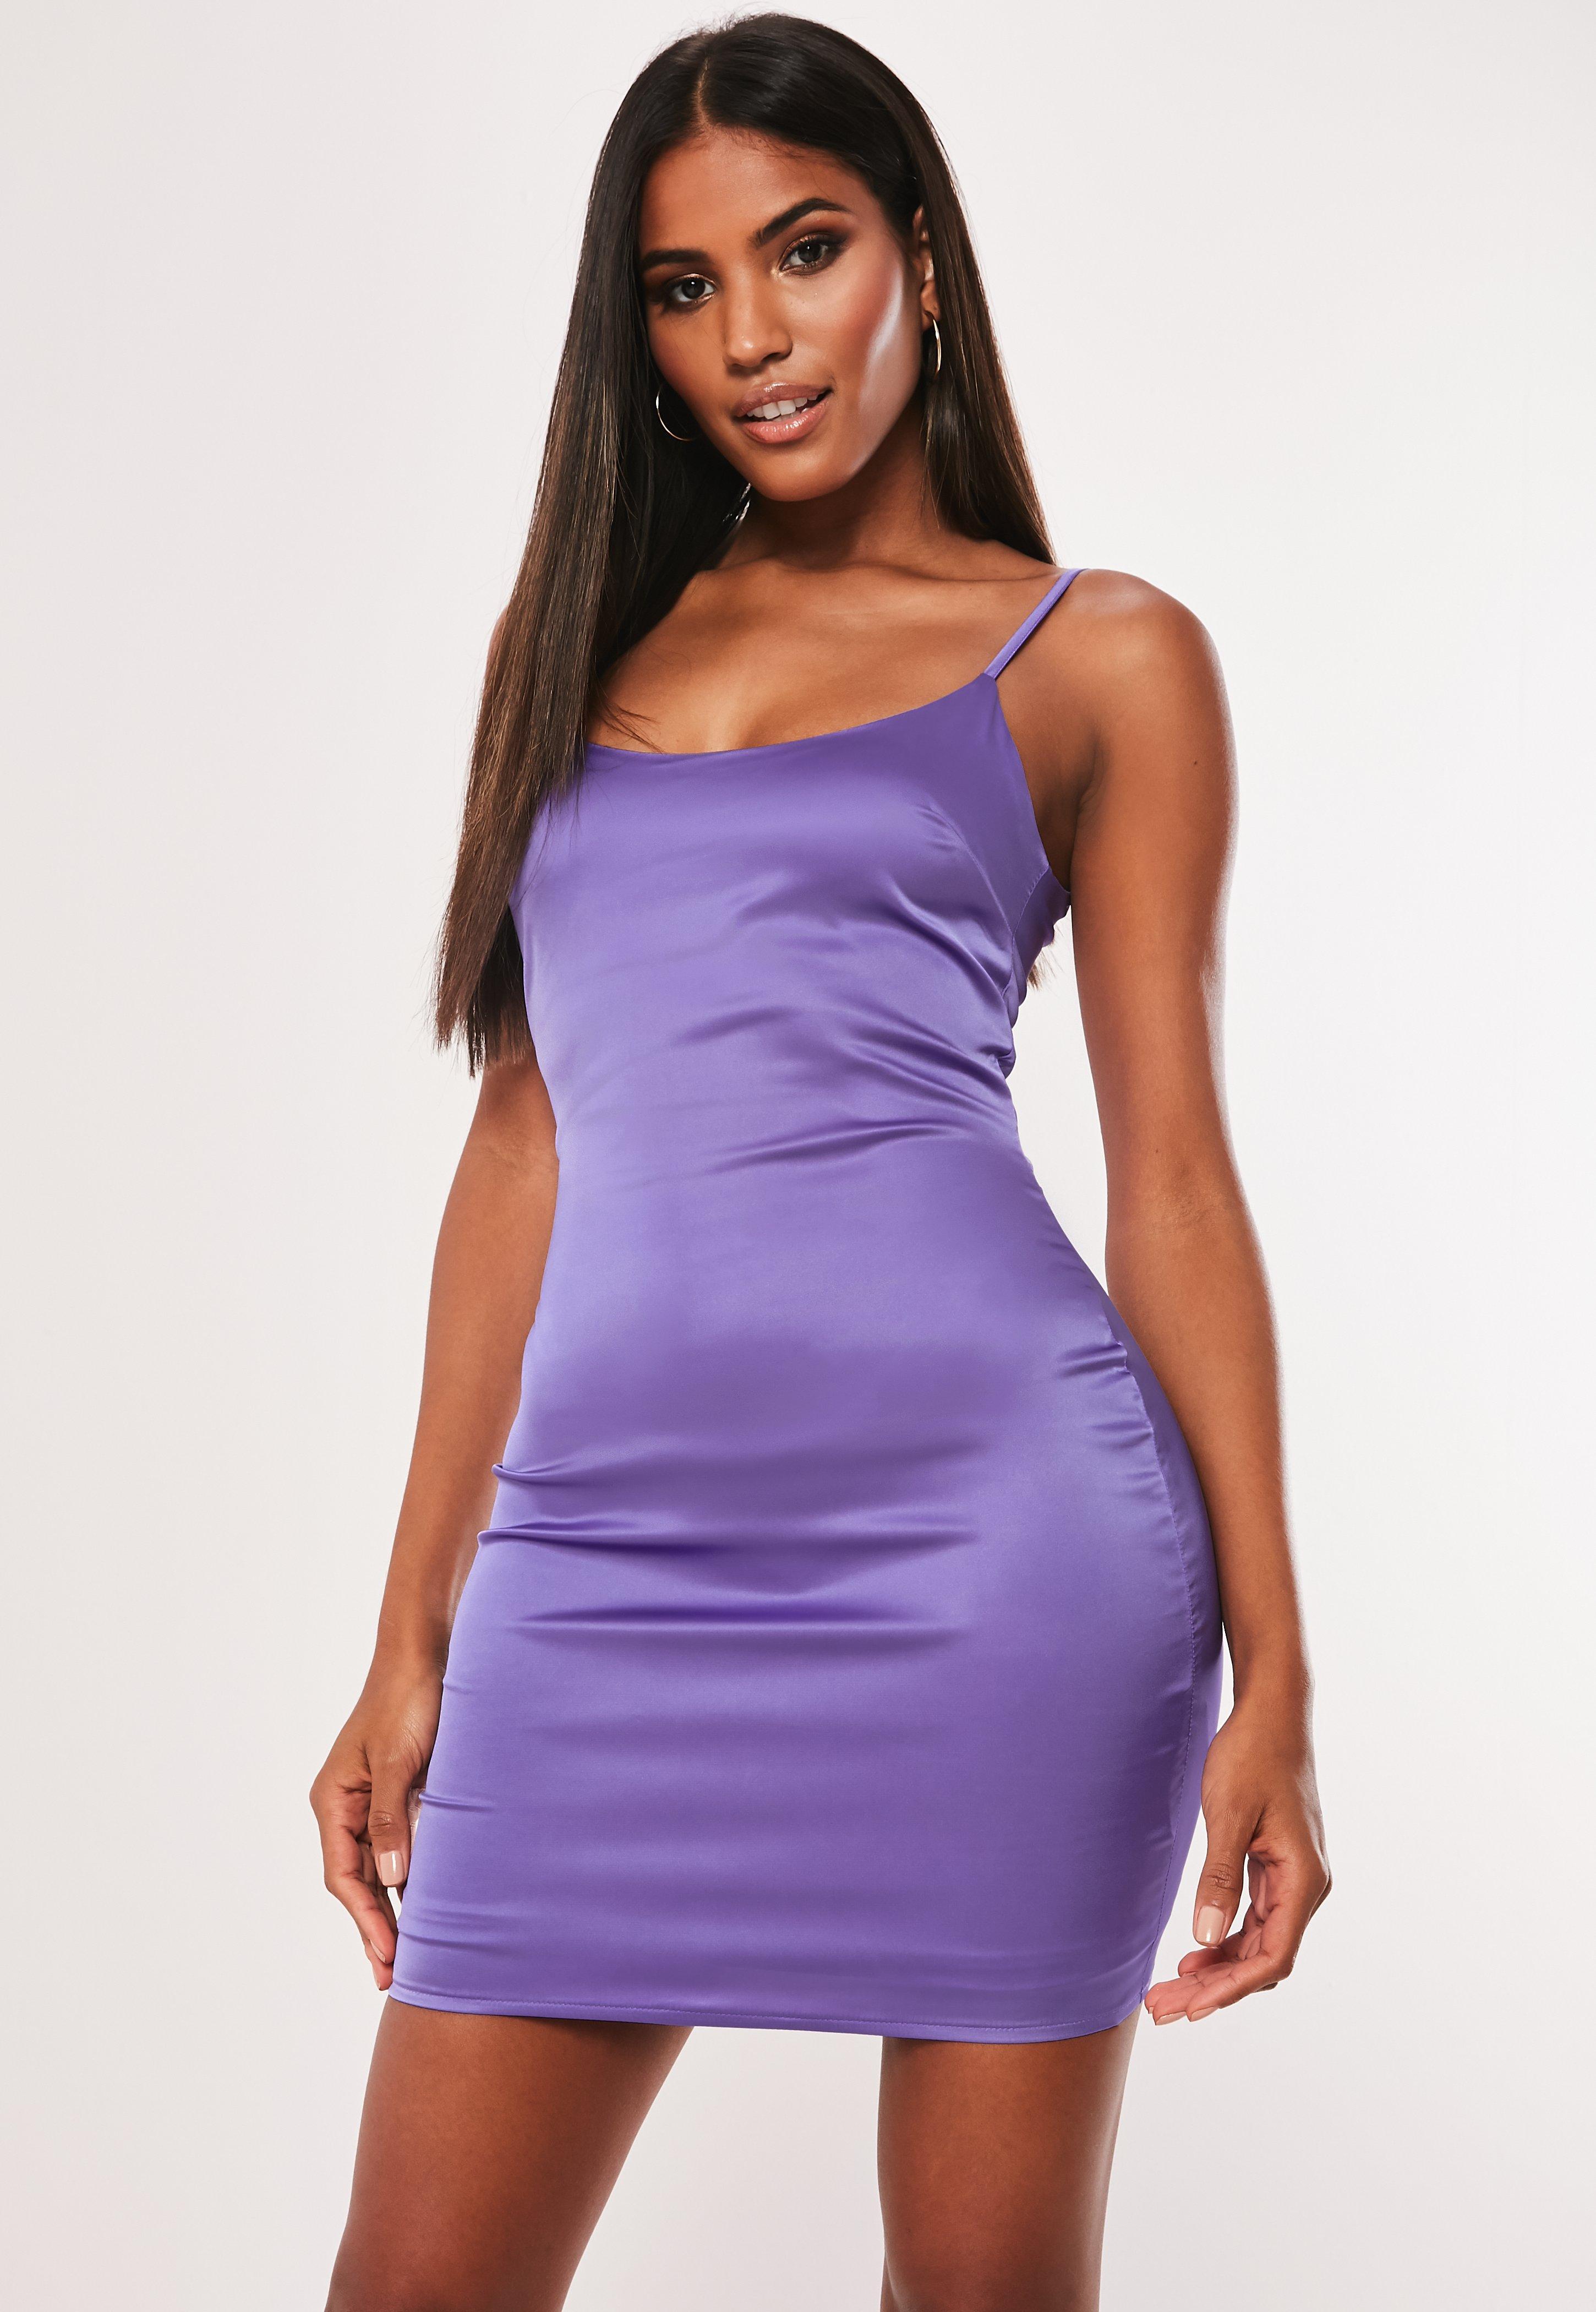 552e07da4b30 Purple Dresses | Mauve & Lilac Dresses - Missguided